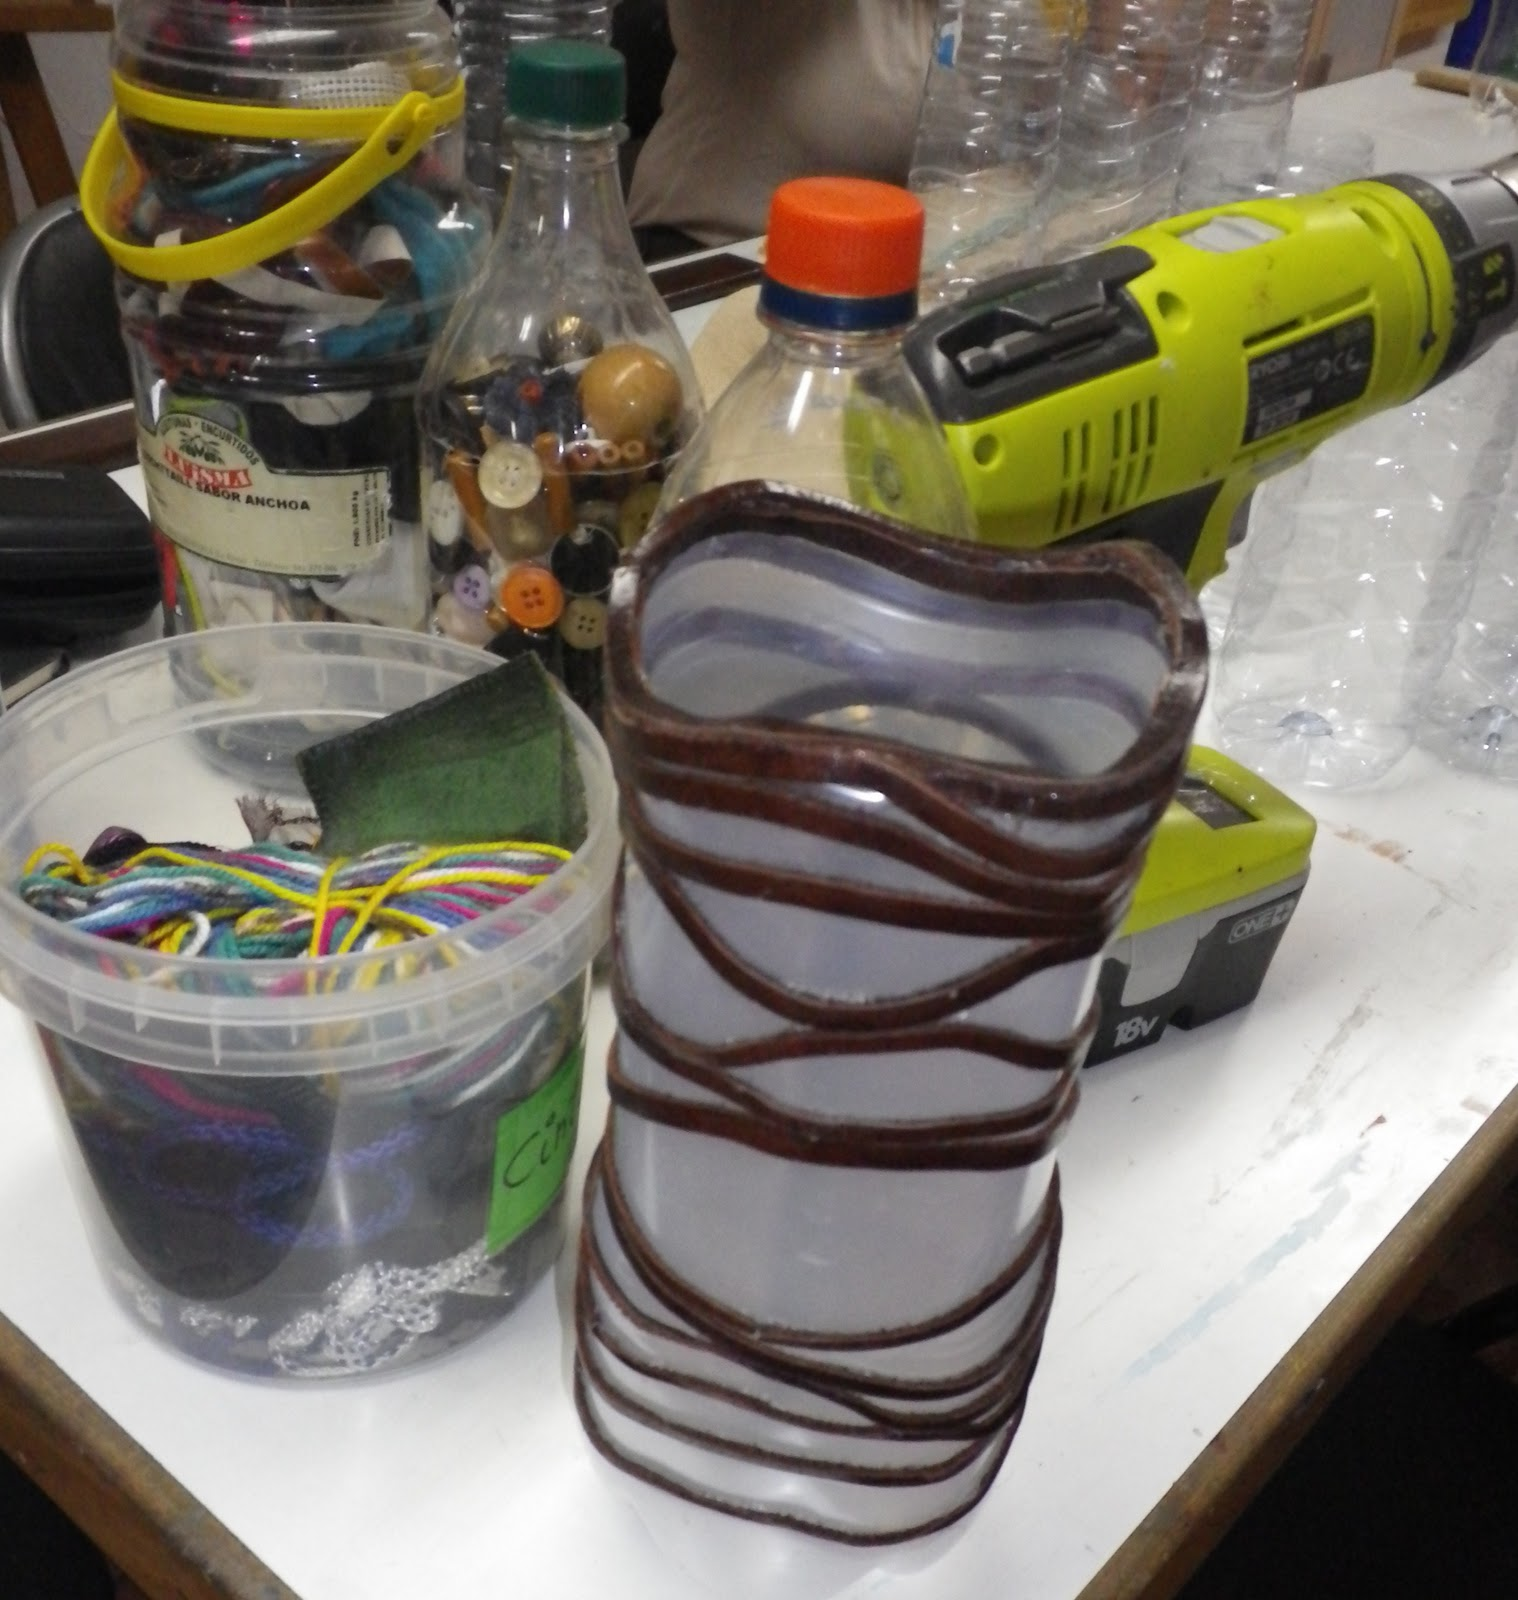 de material de desecho, cosen, mezclan elementos para crear algo